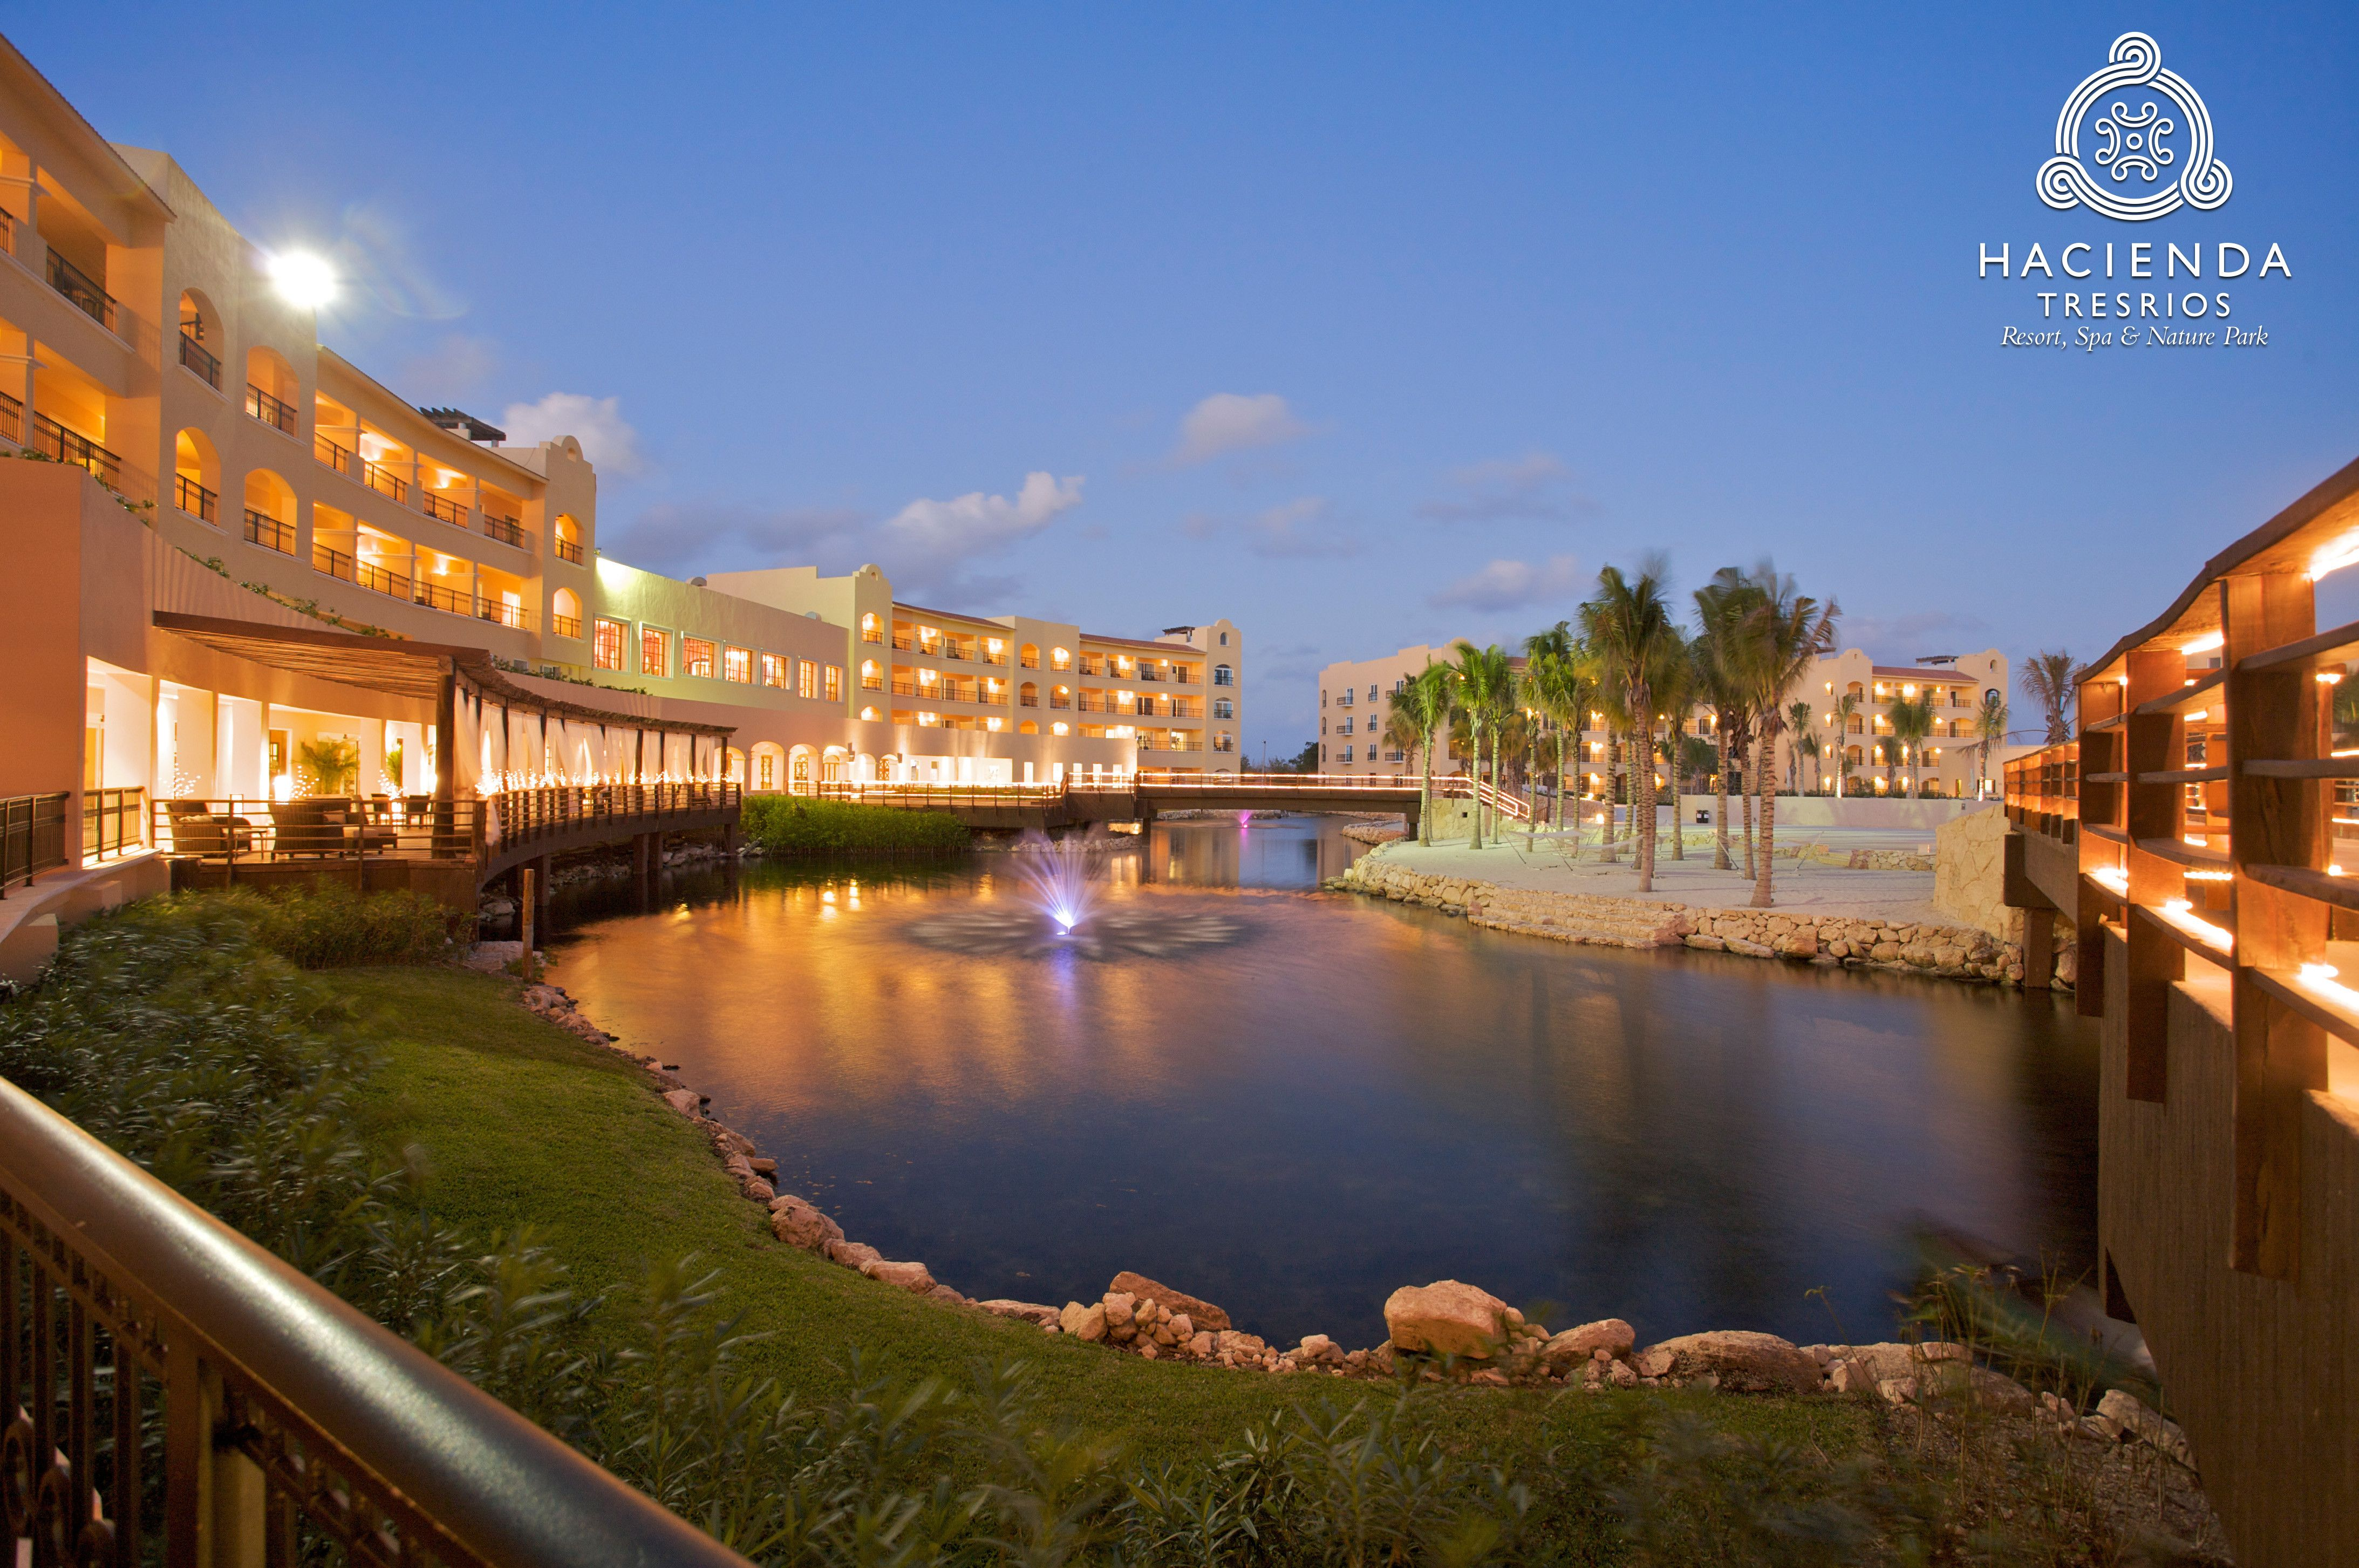 Hacienda Trio Rios Cancun Mexico Resorts Best Resorts Cancun